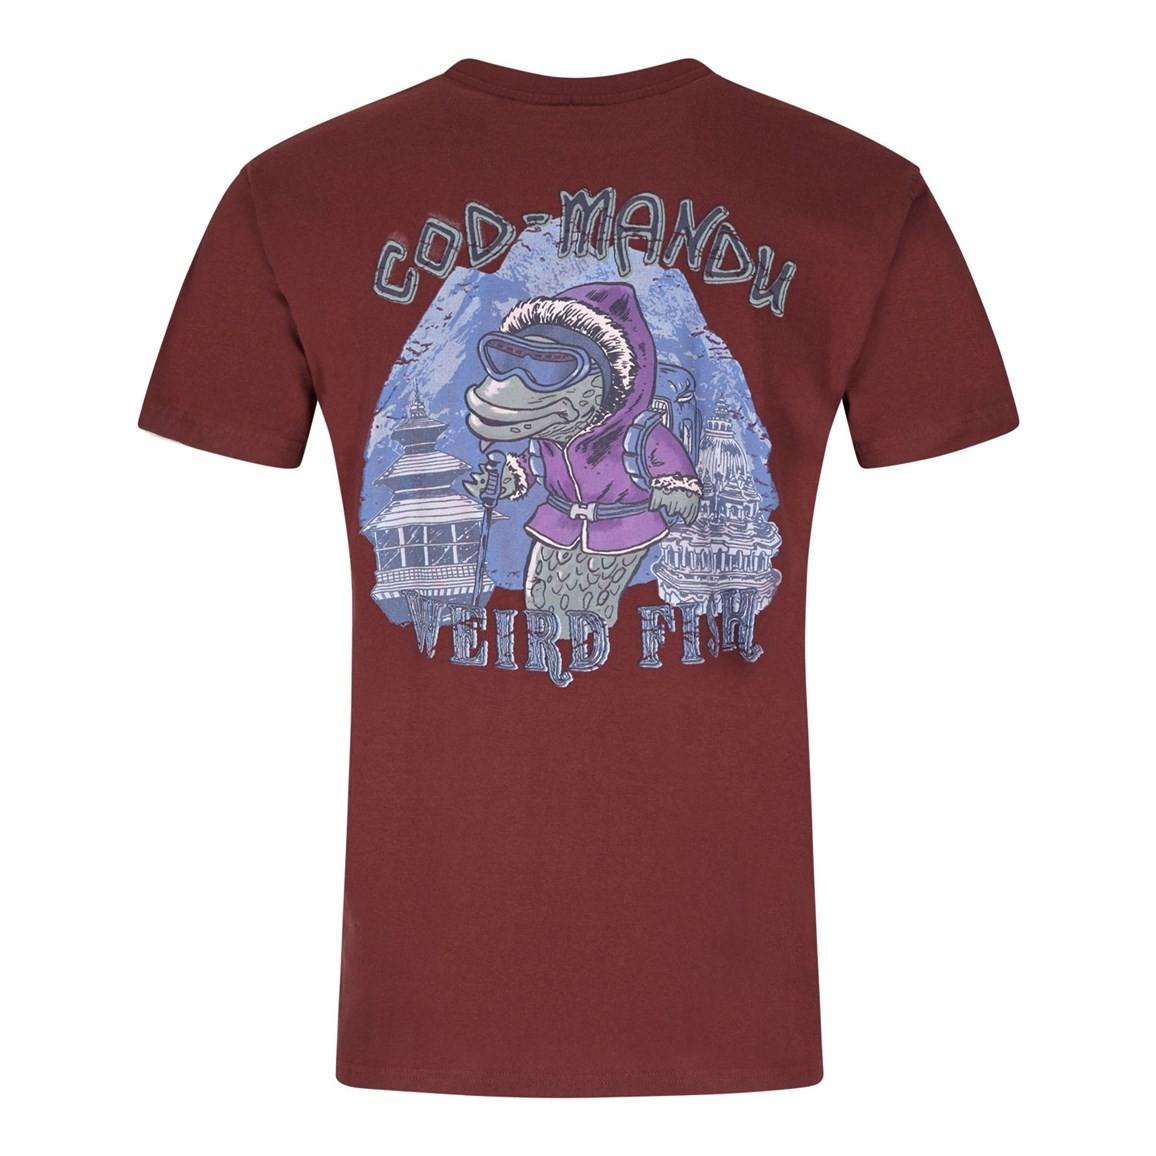 Cod Mandu Printed Artist T-Shirt Conker